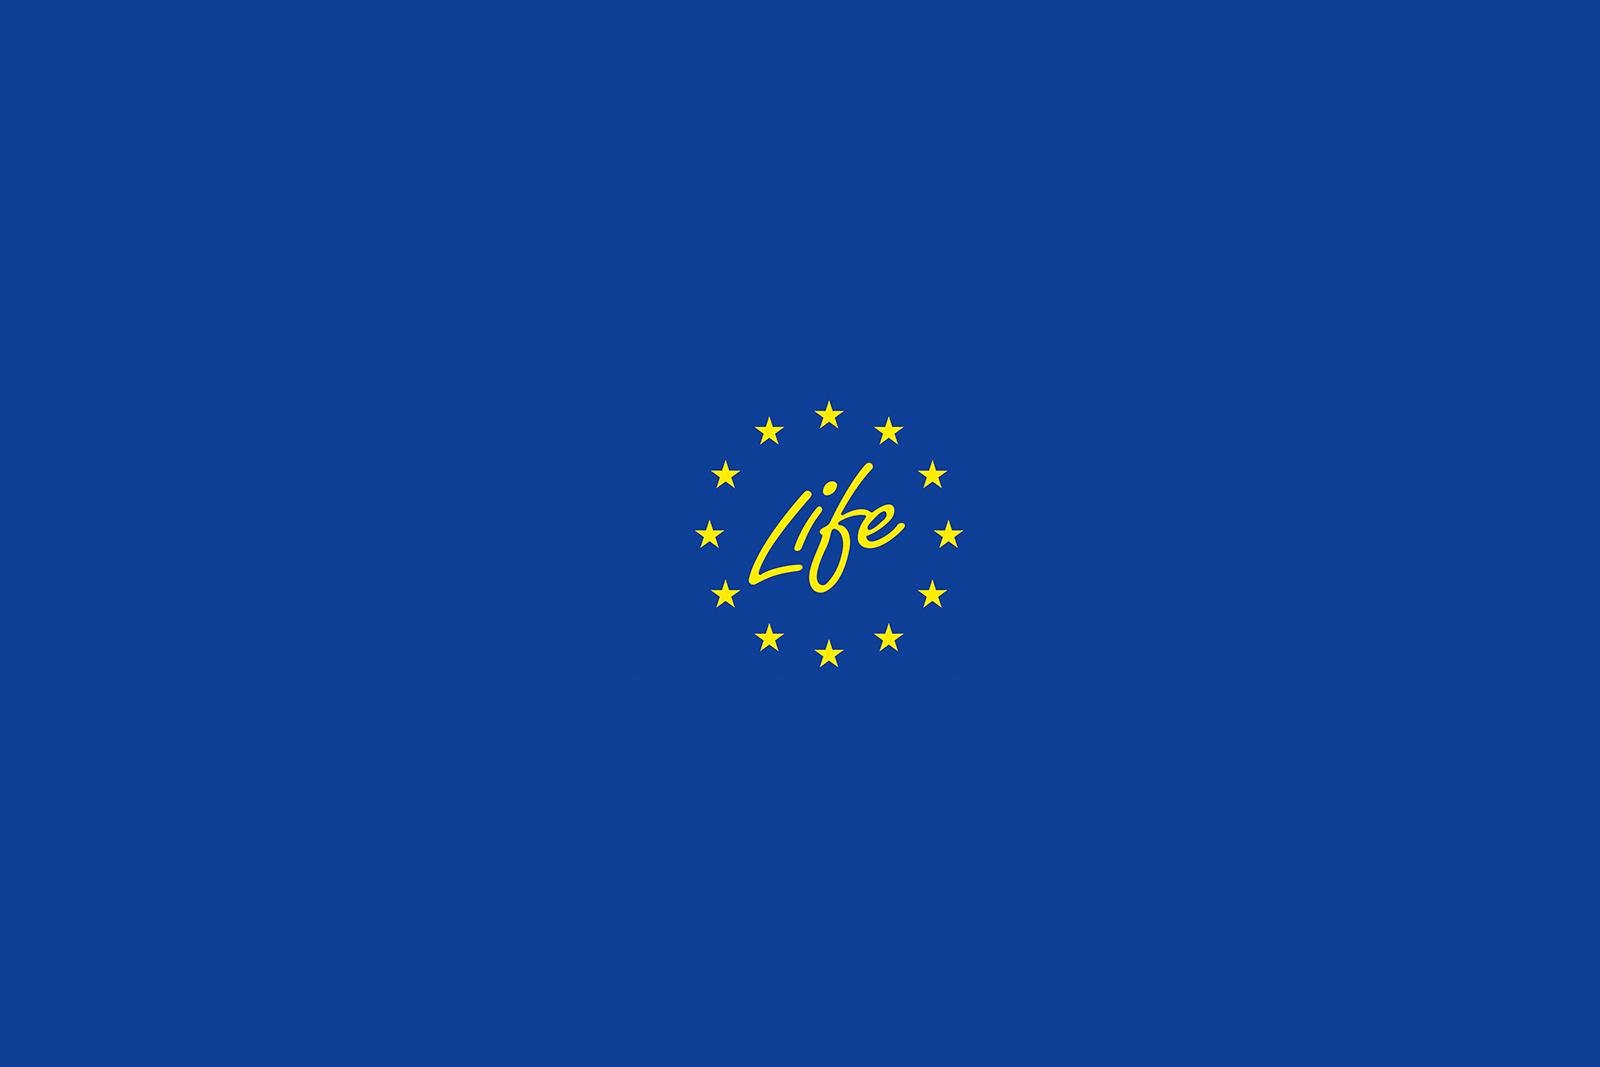 Life+ logo